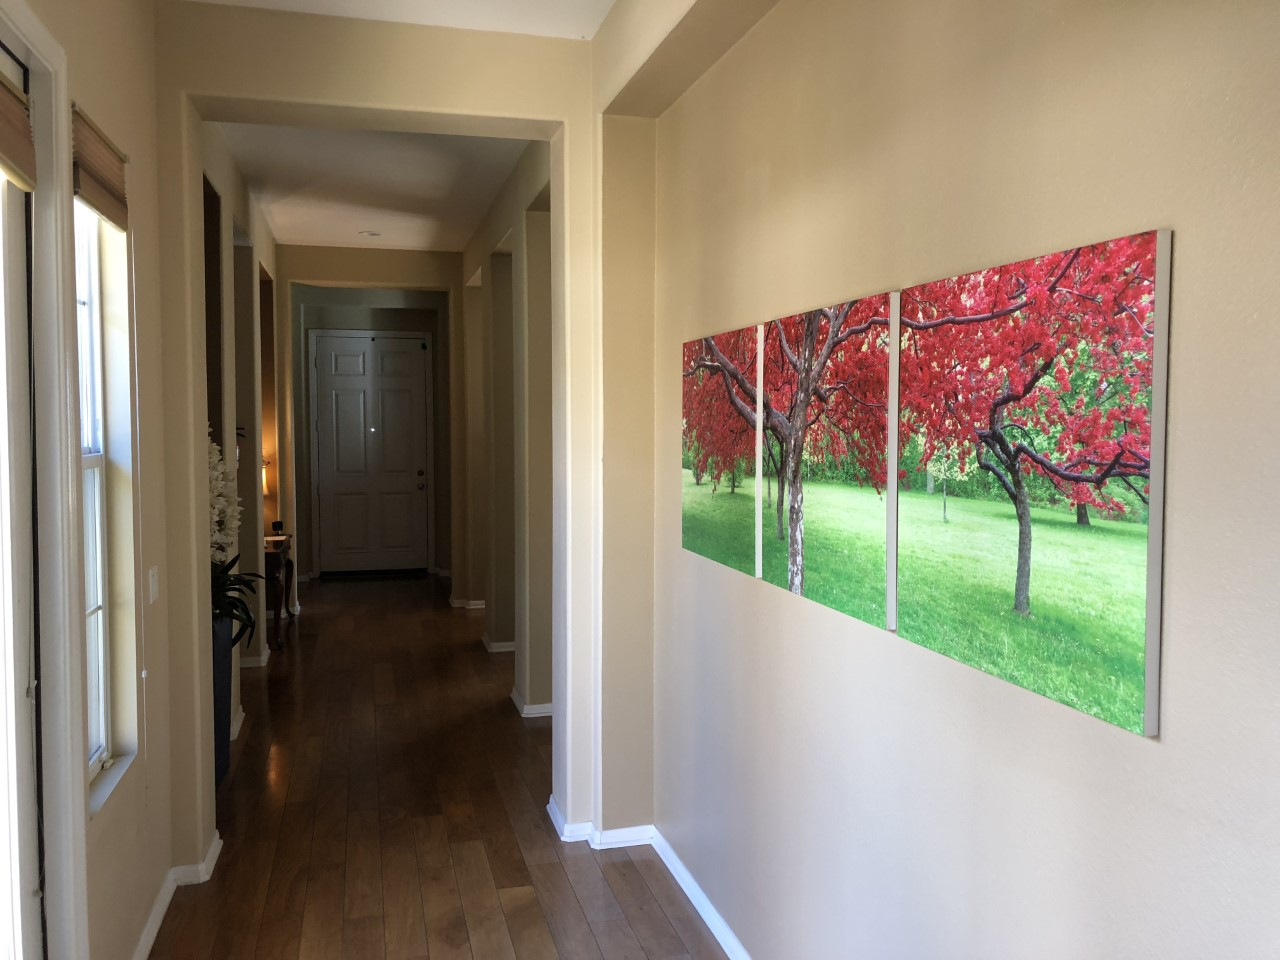 Hallway Pics.jpg